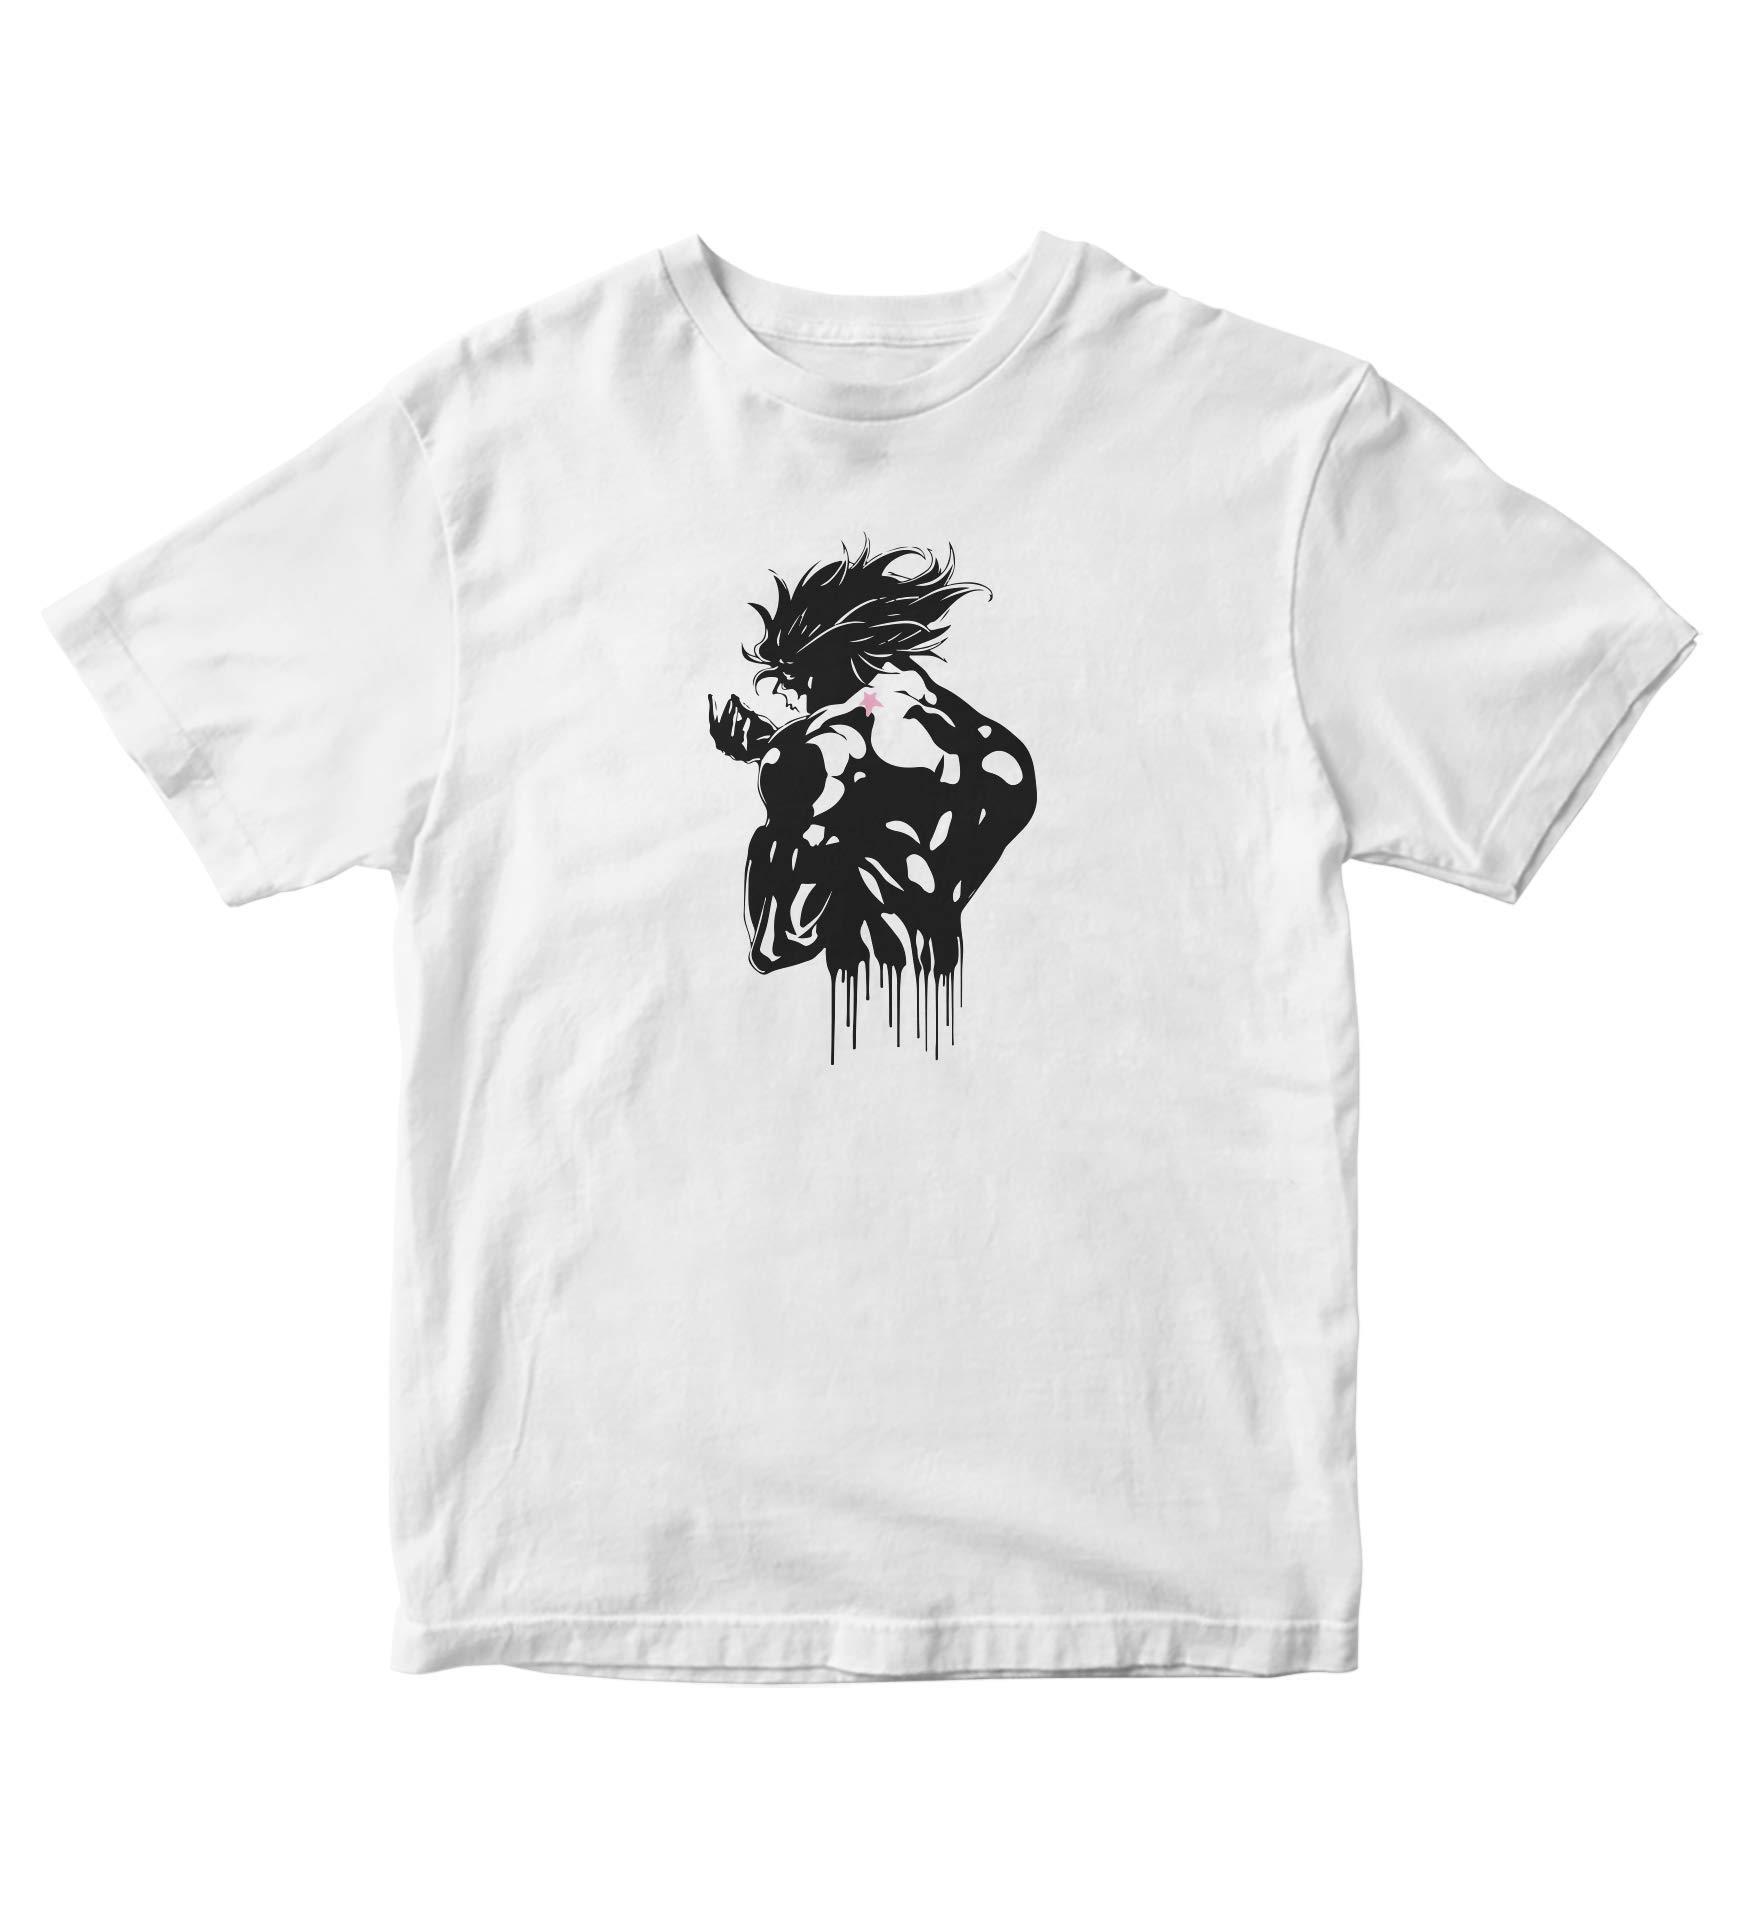 Tjsports Jojos Bizarre Adventure Shirt Dio Brando Anime Manga S Shirt A756